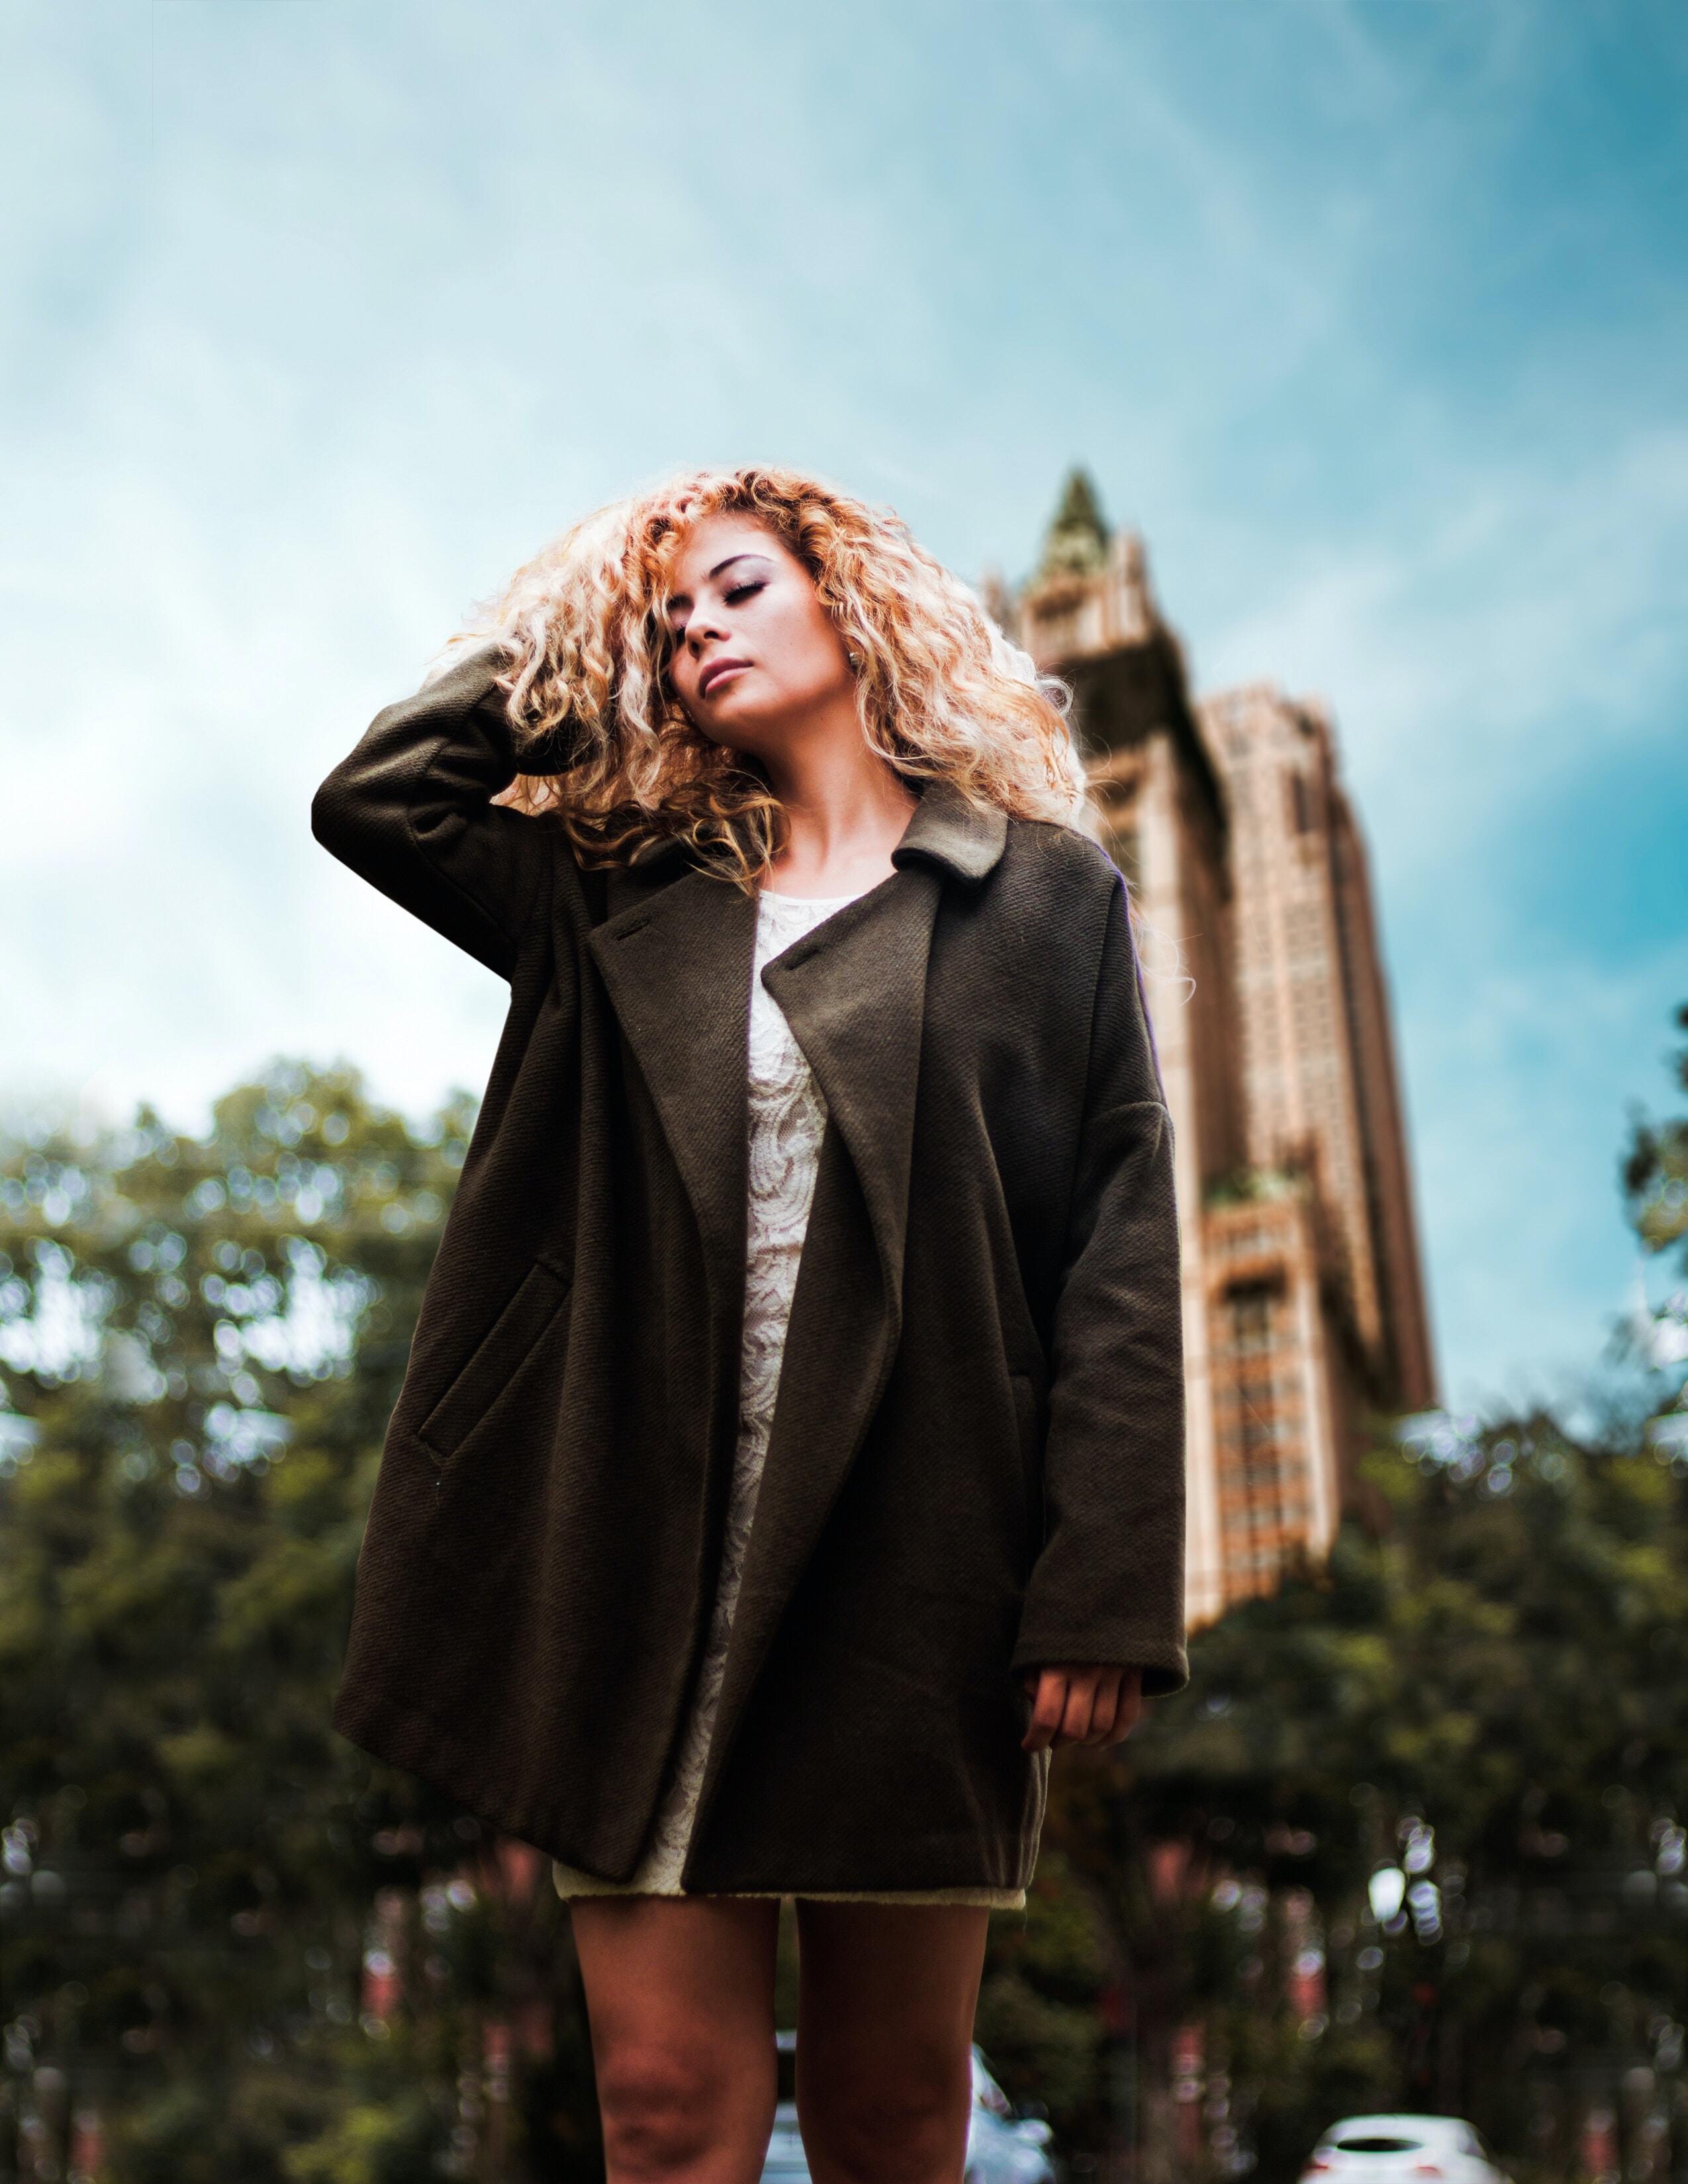 woman in black coat